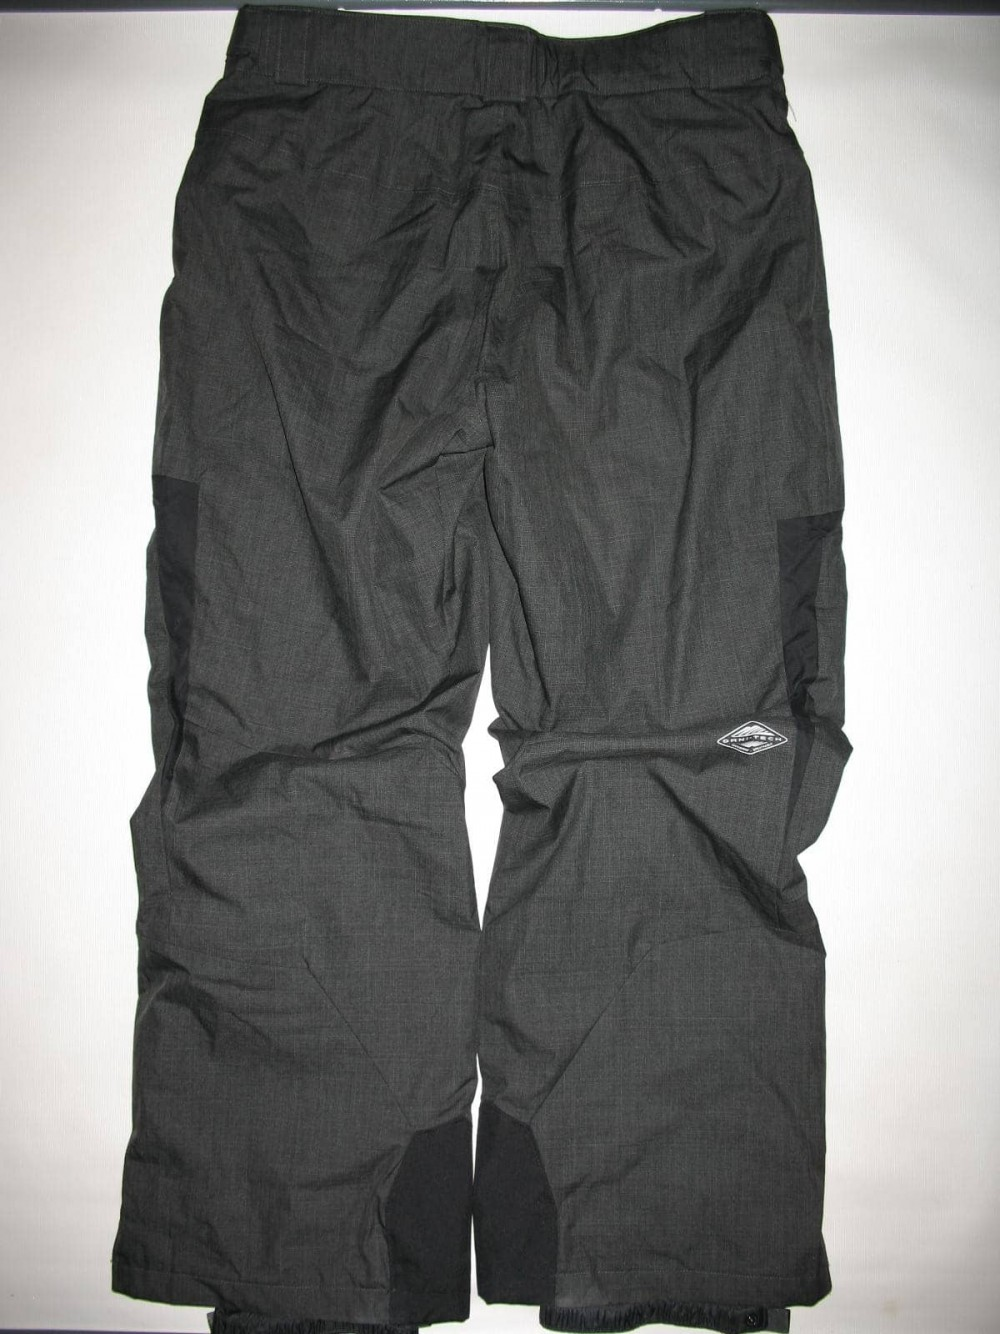 Штаны COLUMBIA echochrome ski pants (размер XL) - 3